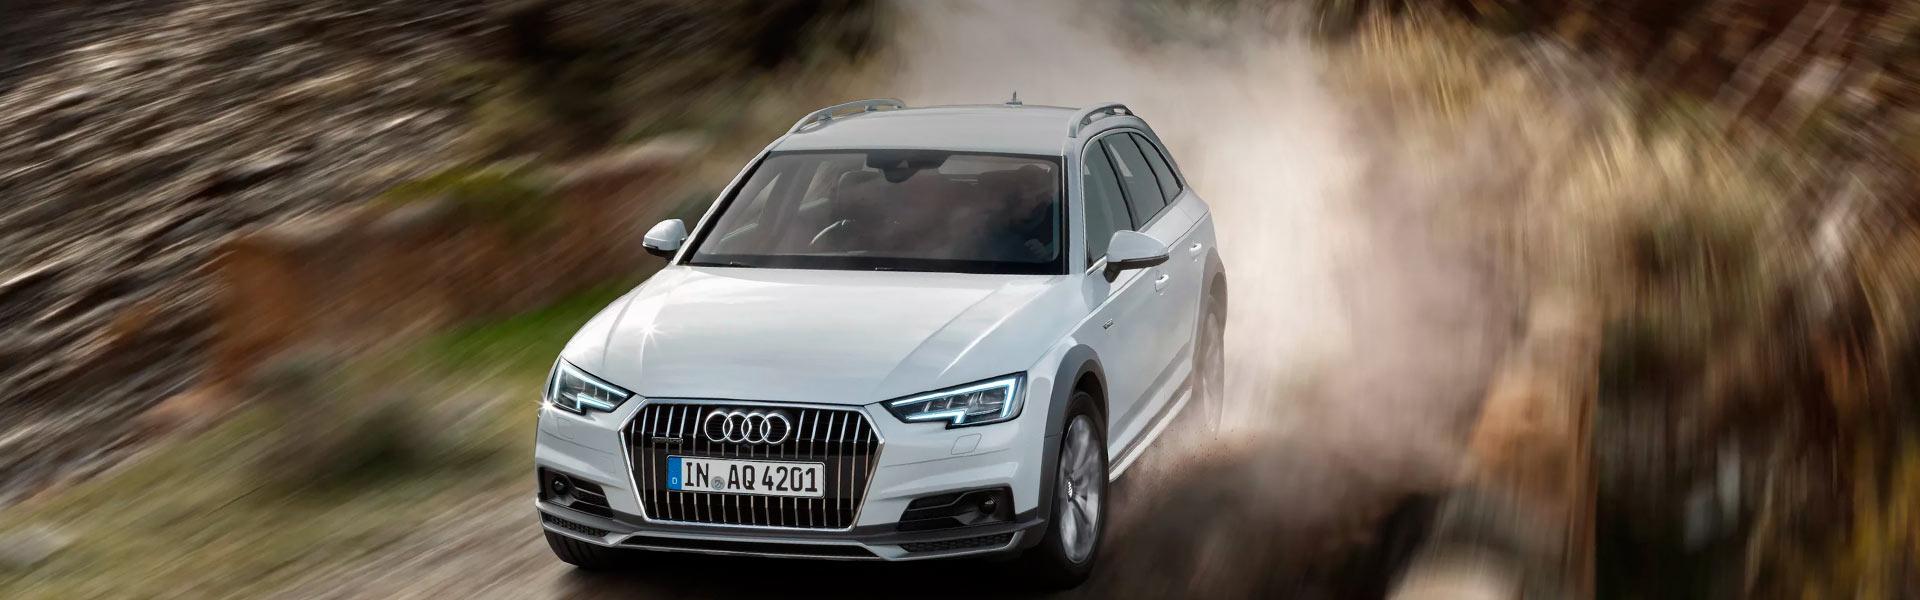 Ступица на Audi A4